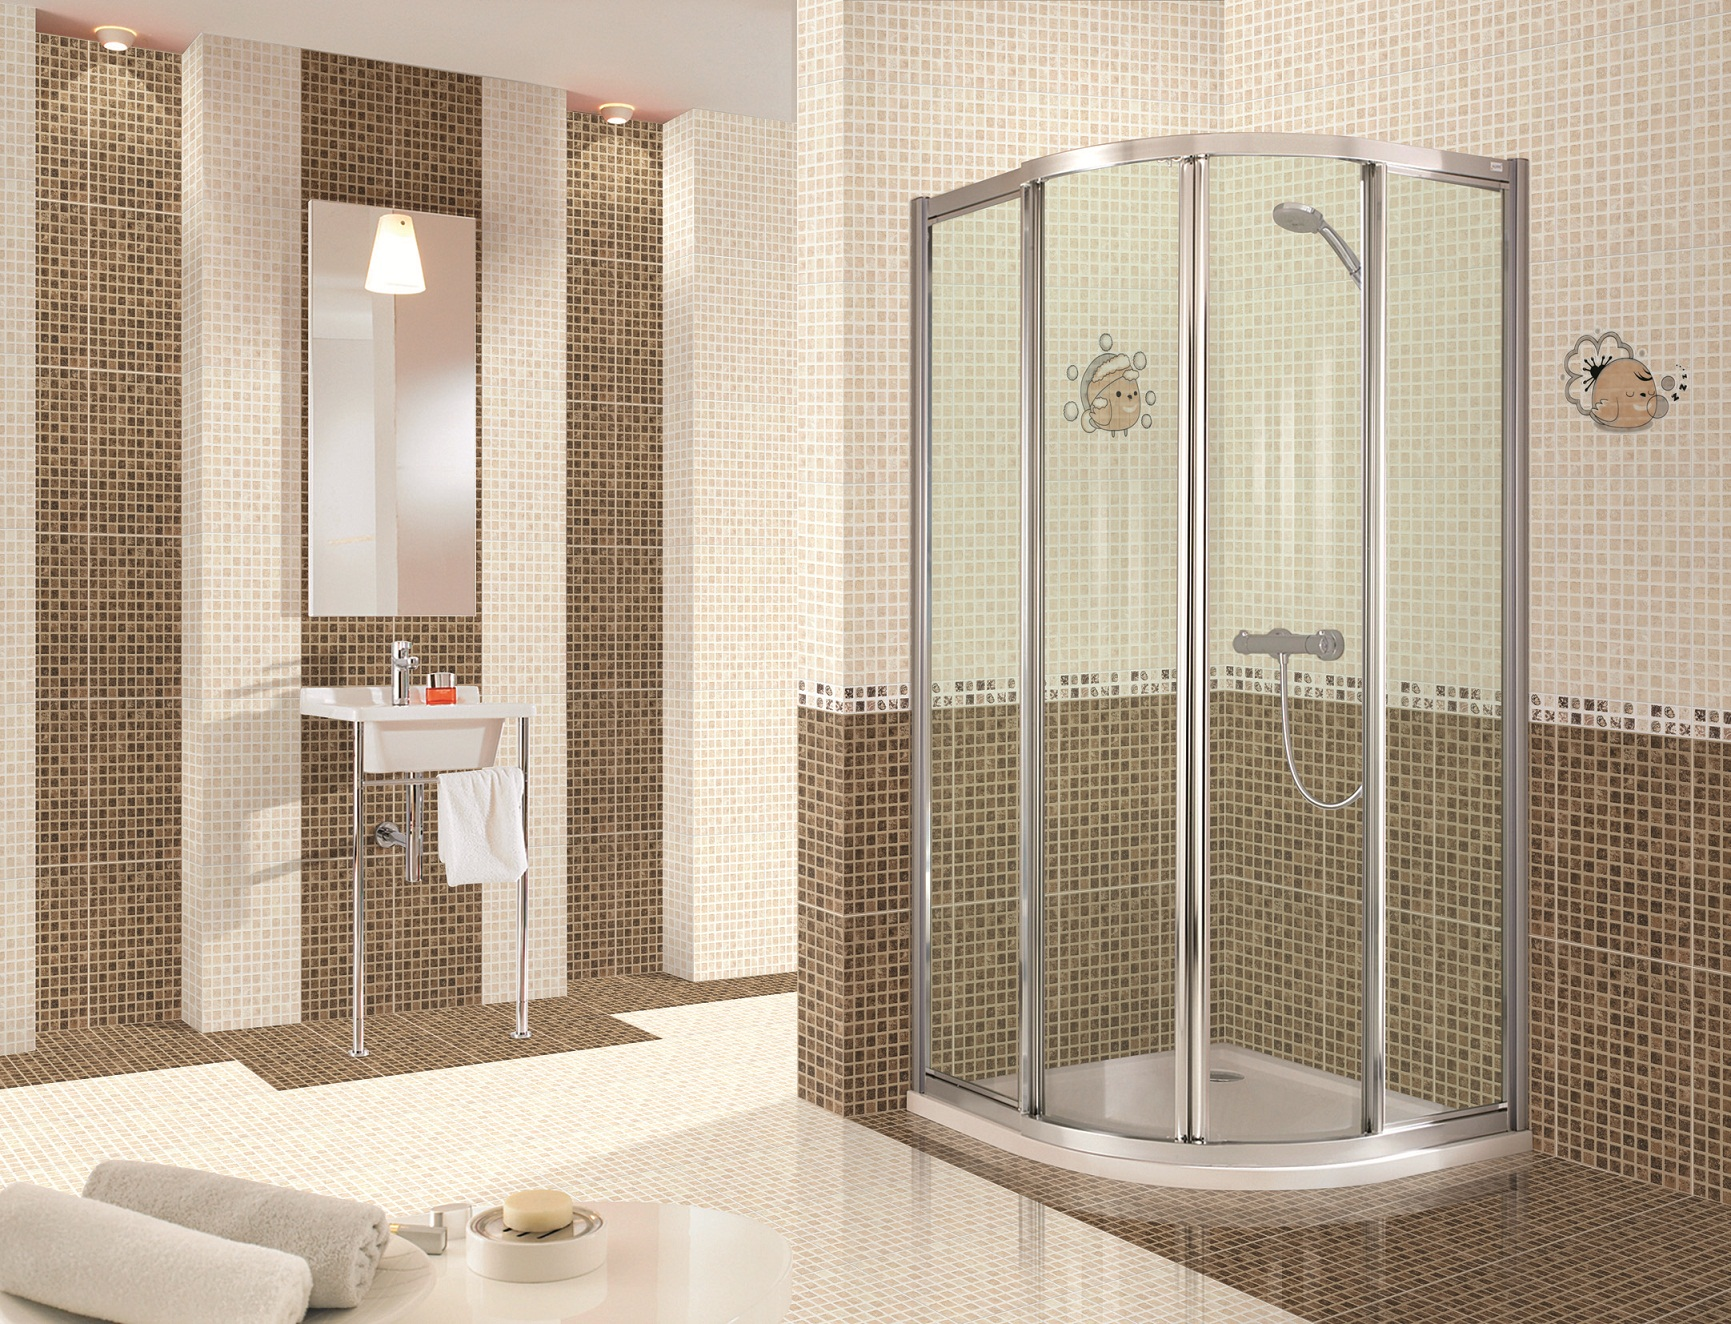 Bathroom tile designs 2016 - Ceramic Wall Tile Design Brilliant With Interesting Bathroom Decorating Ideas New Trendy Washroom Designs With Tiled